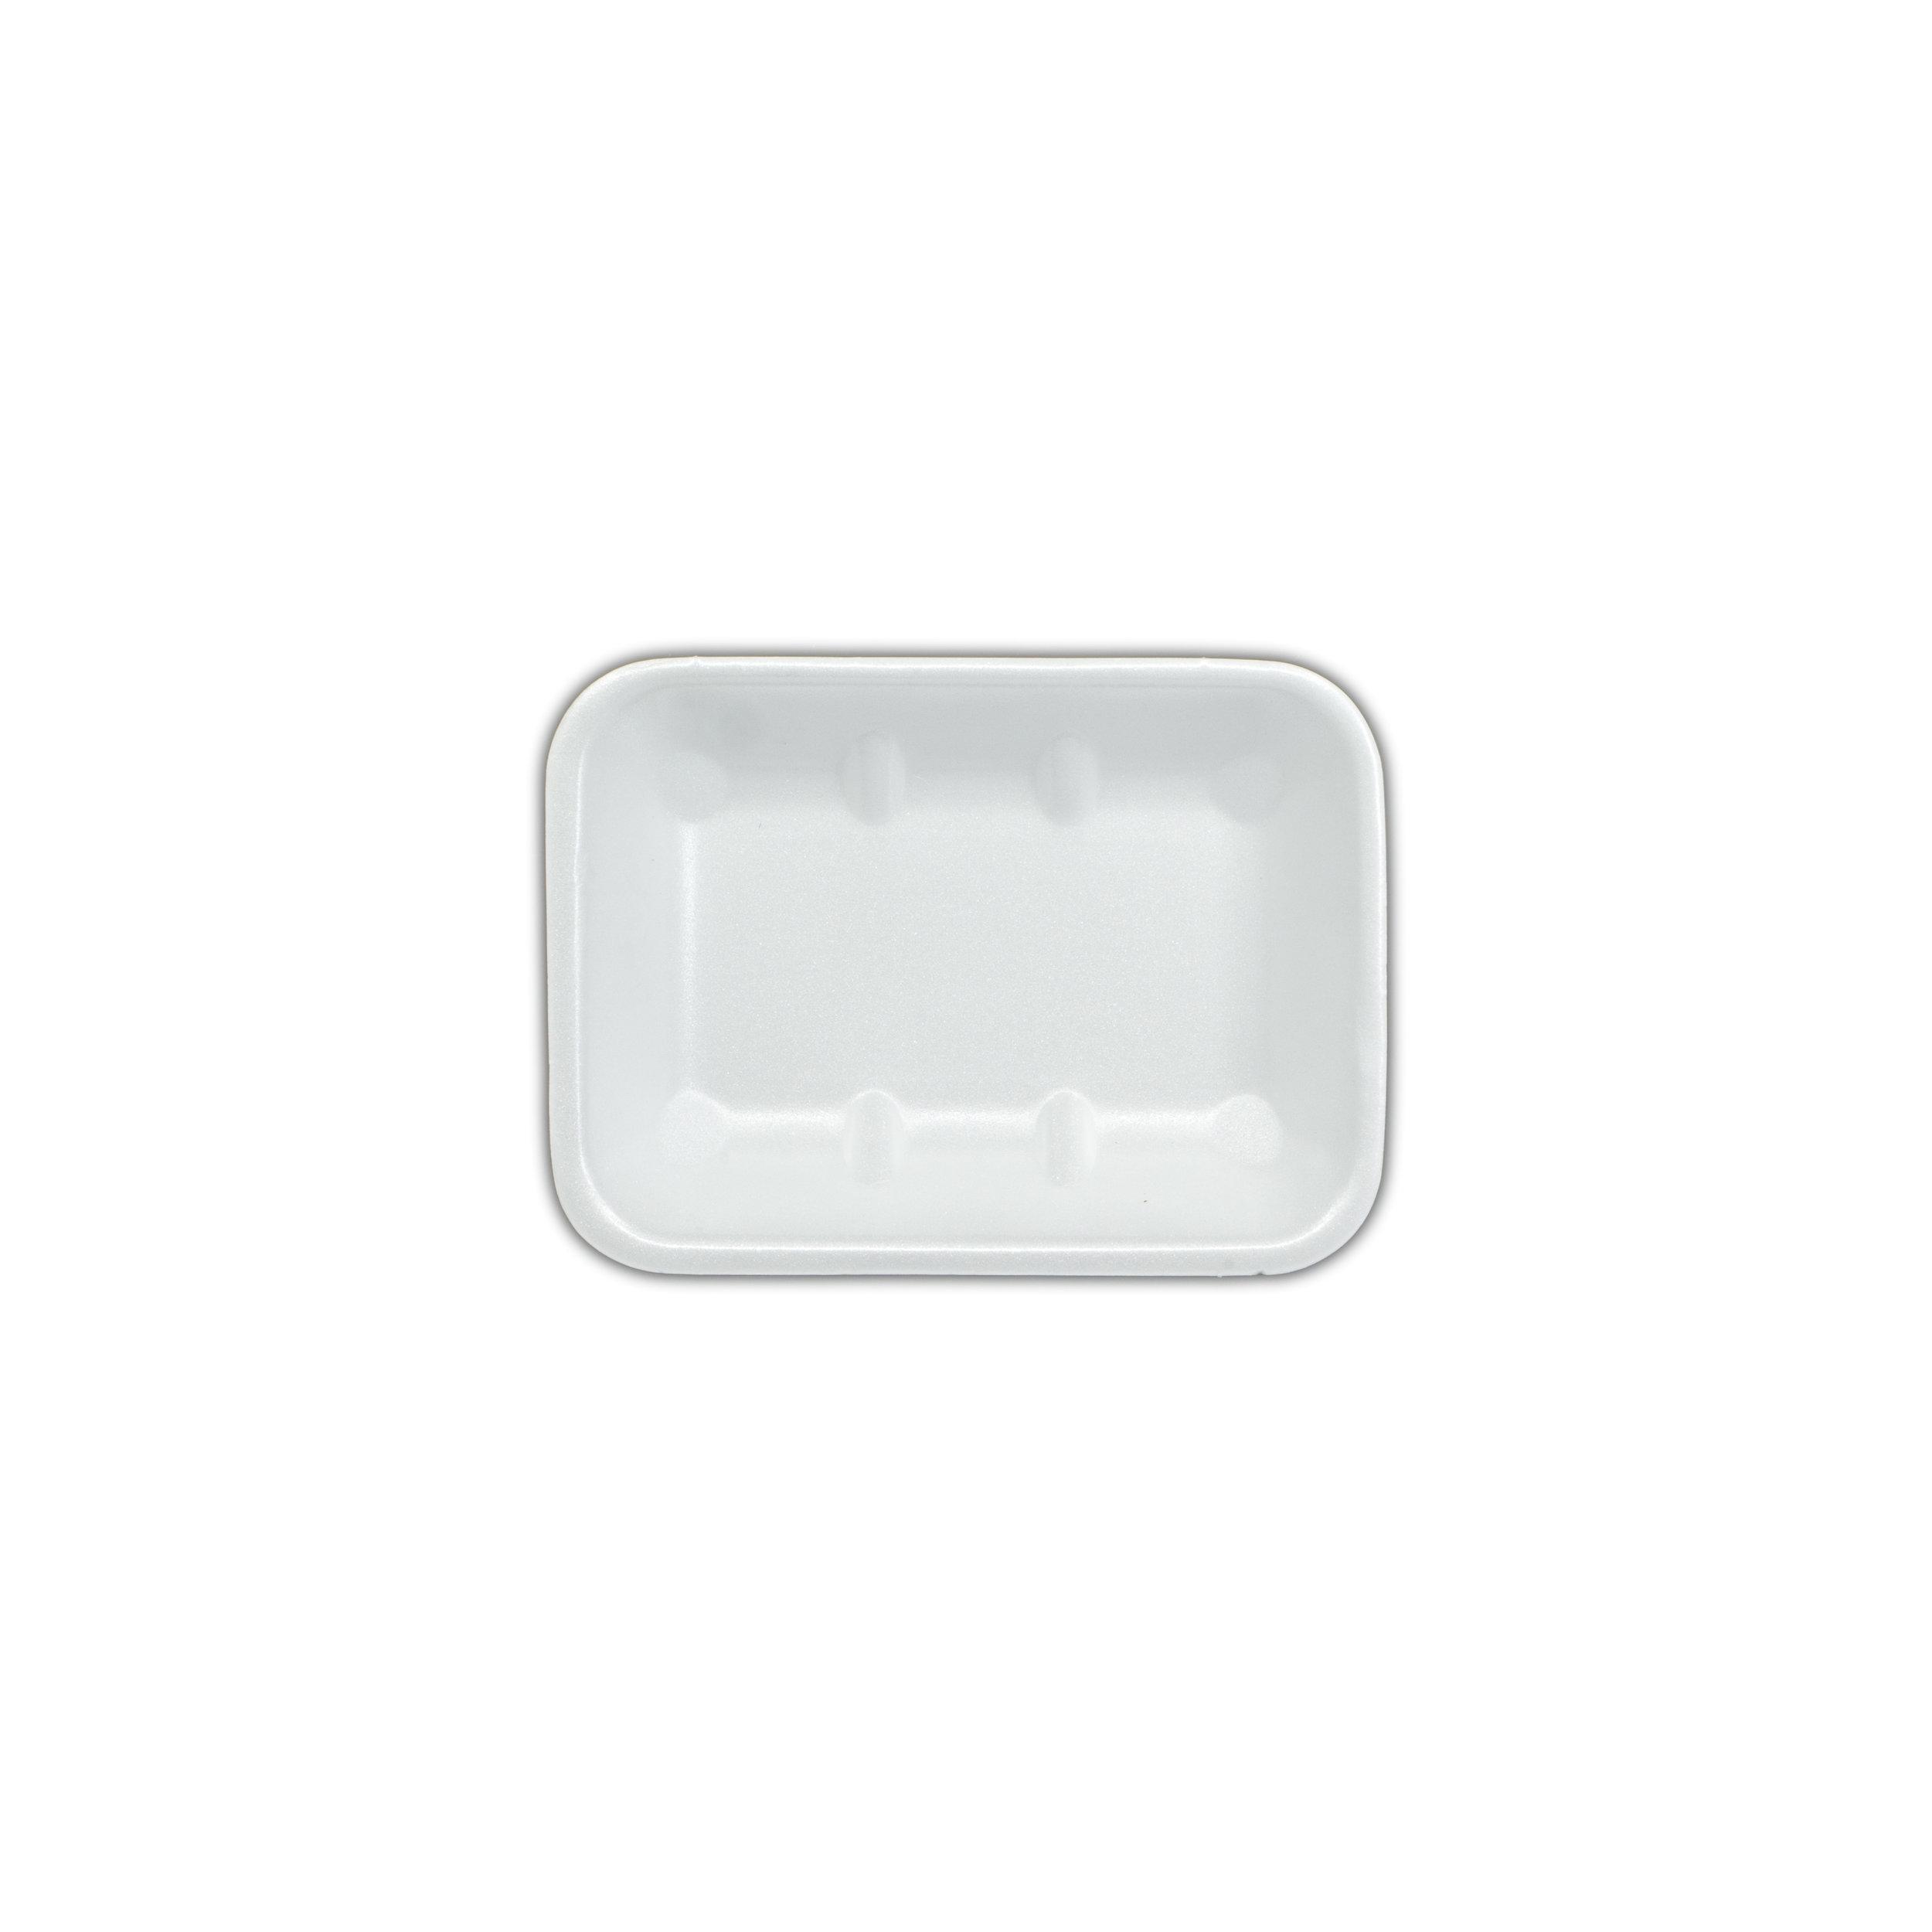 iK0201 CLOSED CELL DEEP 7x5   WHITE   90 per sleeve 720 per carton